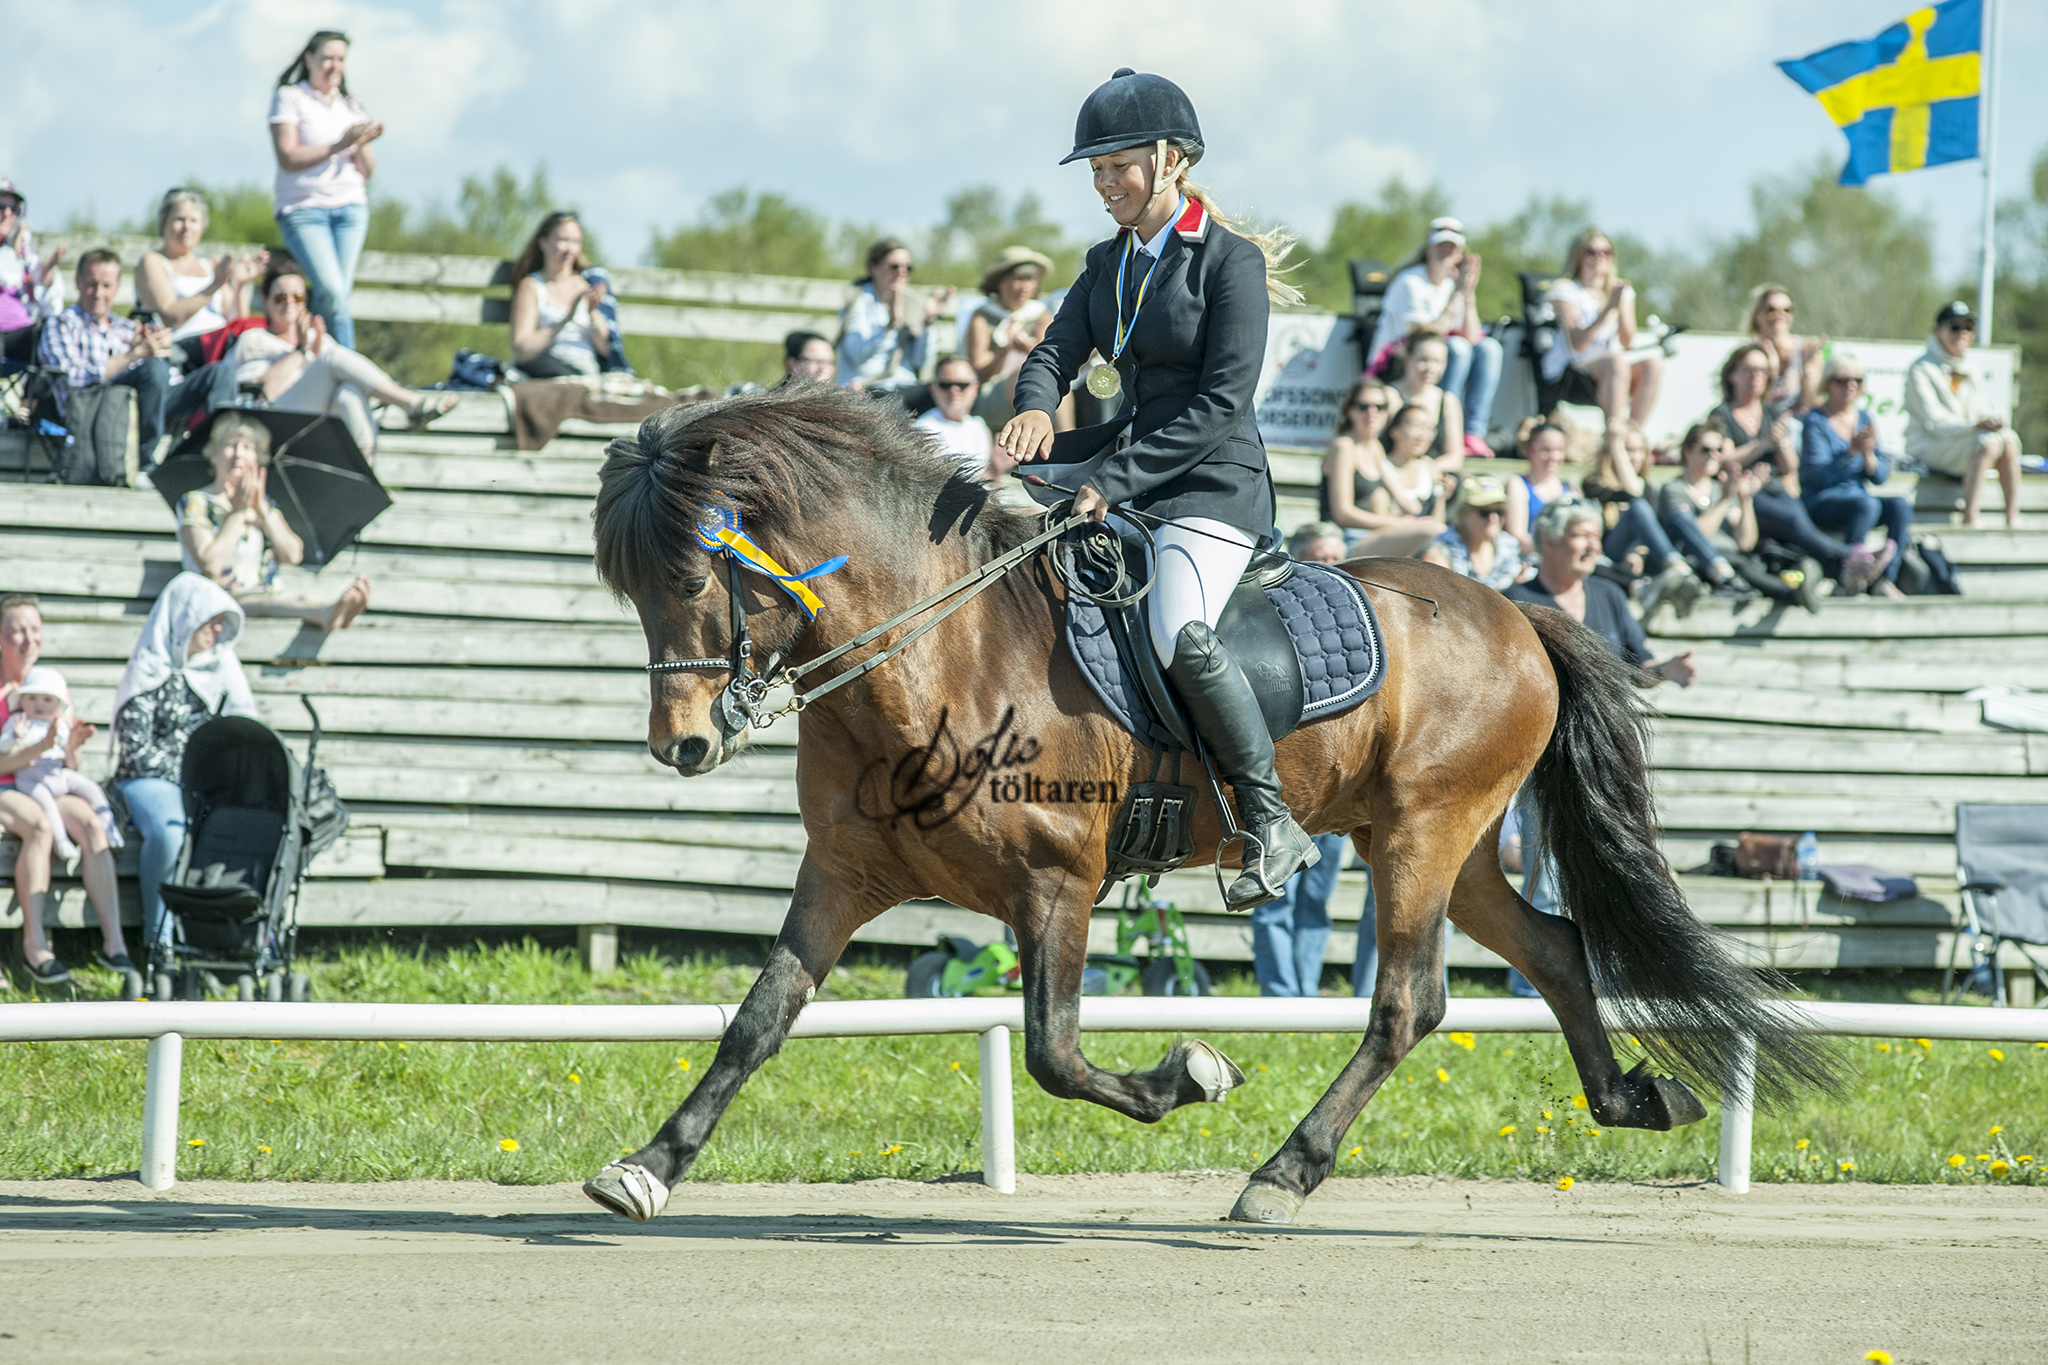 Vinnarna av fyrgången V1, Helena Kroghen Adalsteinsson och Kavaler fra Kleiva Foto: Sofie Lahtinen Carlsson